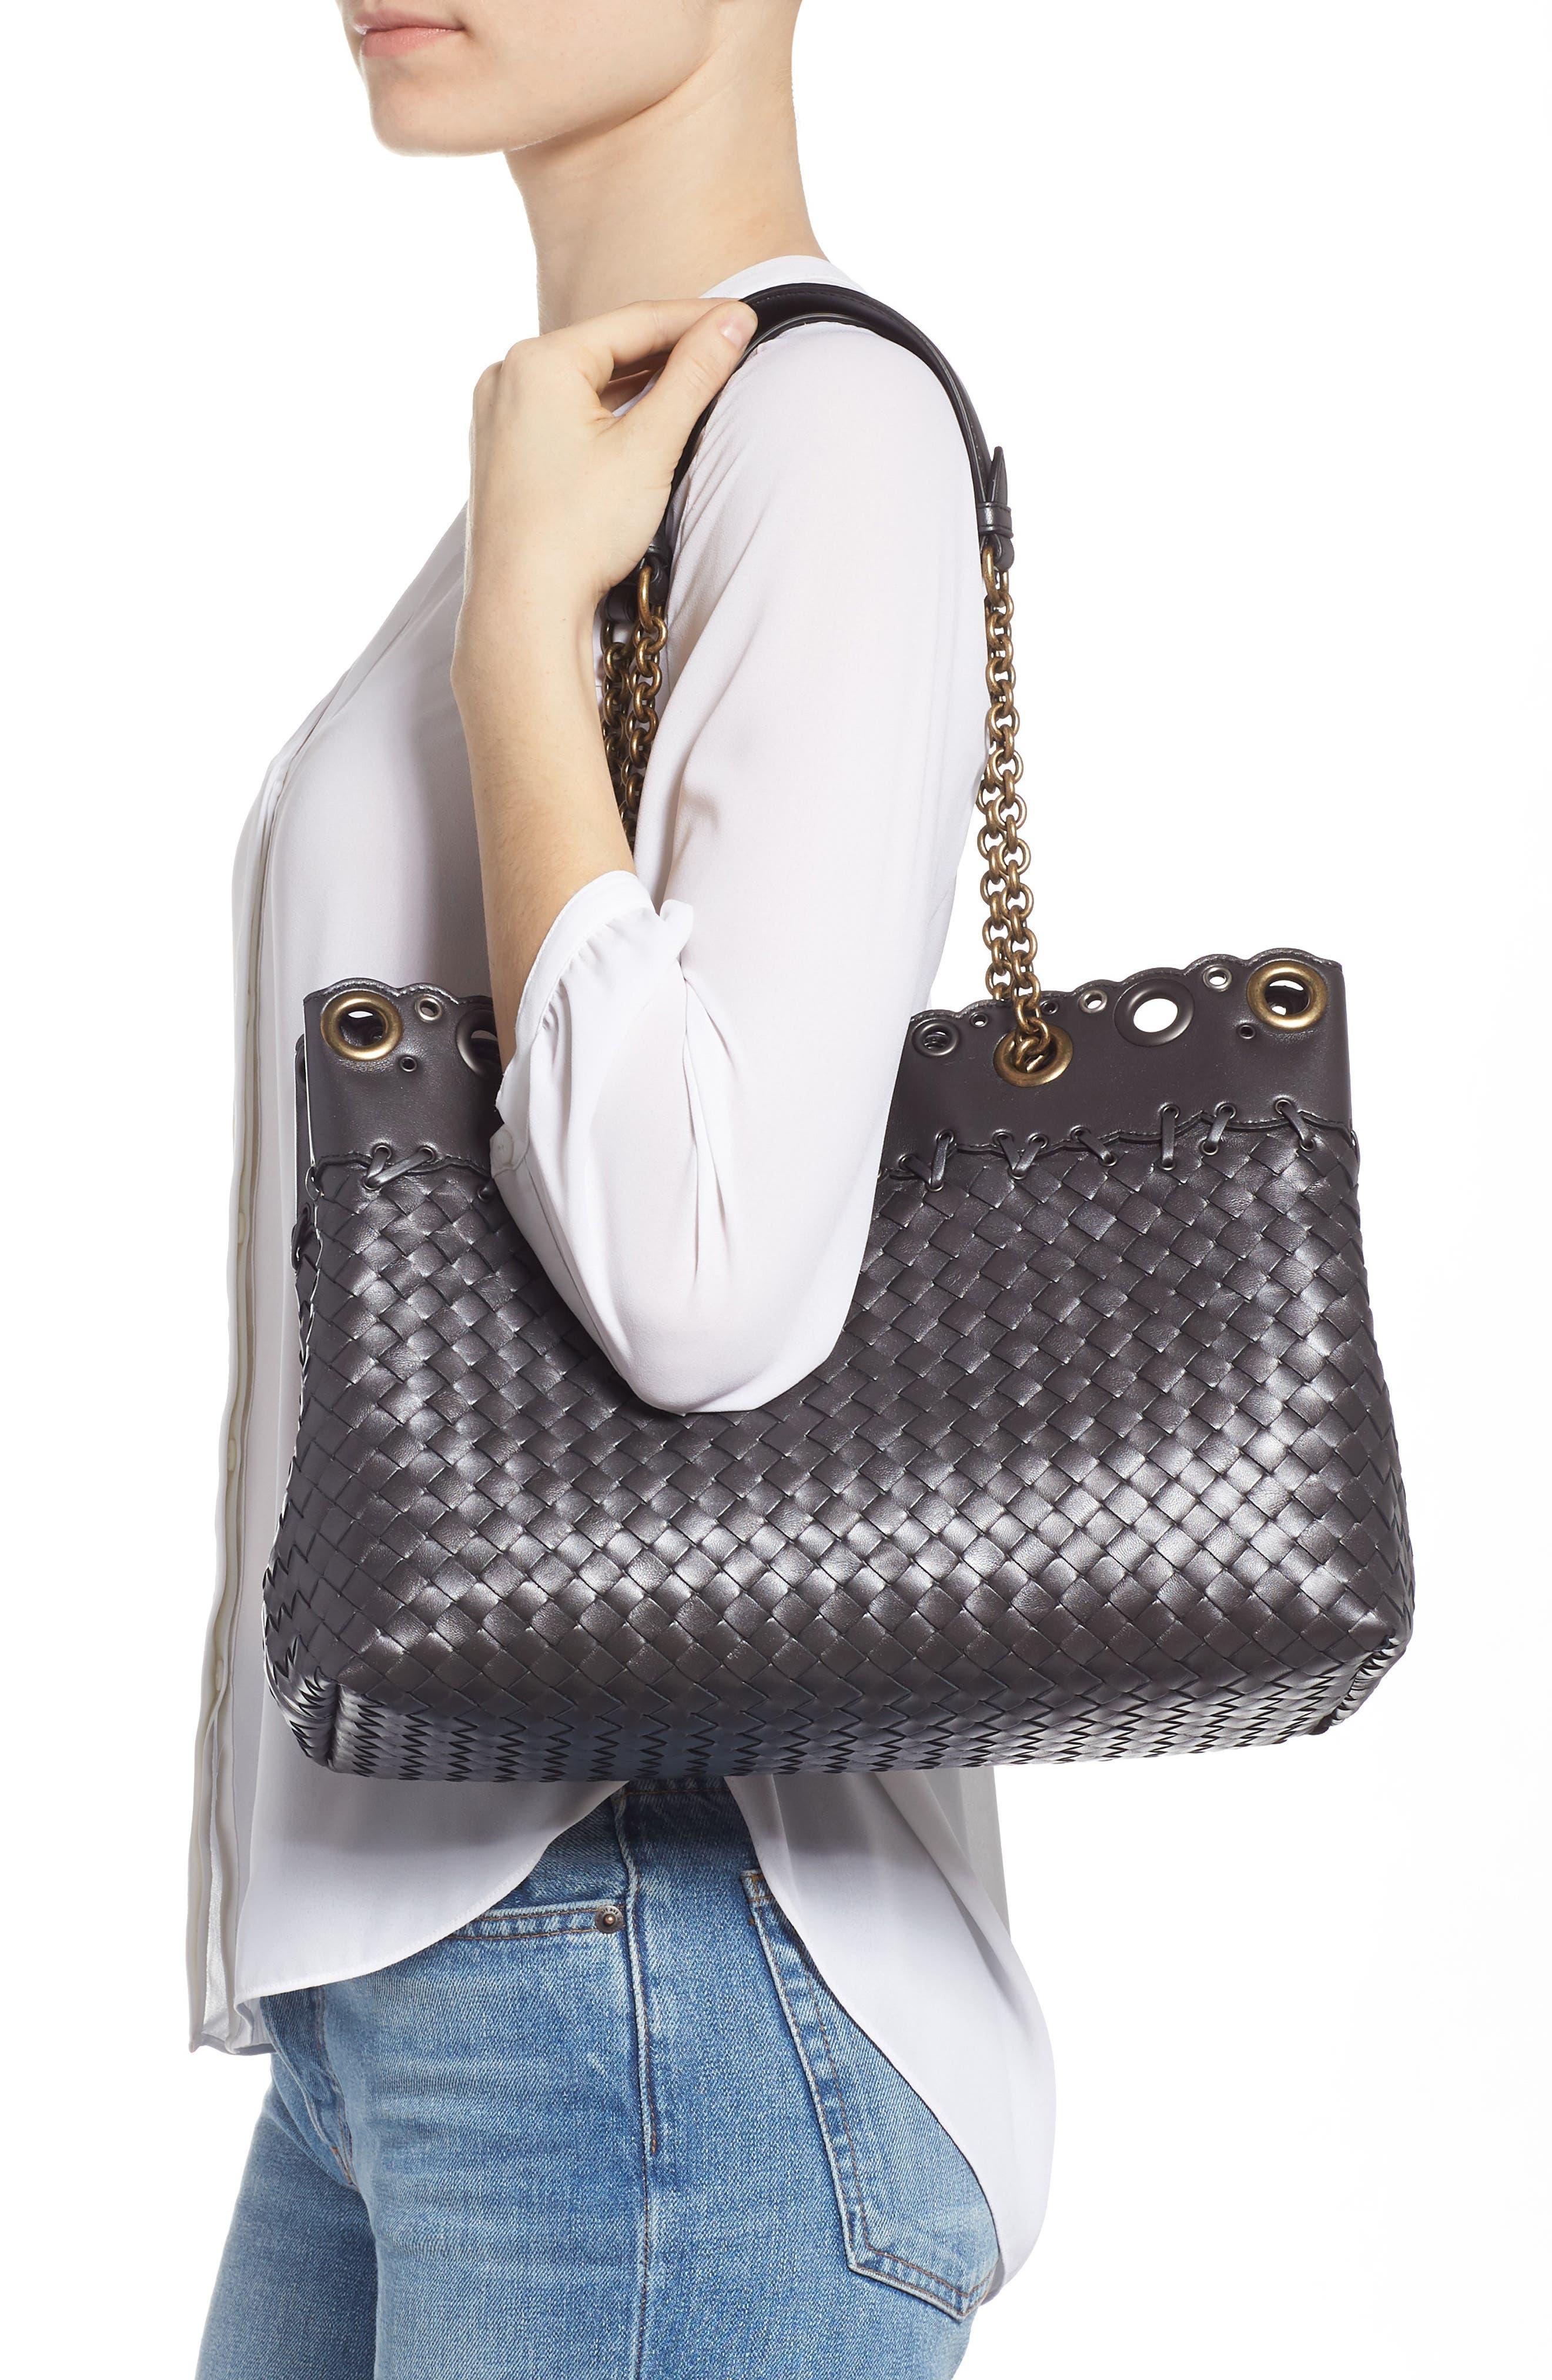 Intrecciato Leather Tote Bag,                             Alternate thumbnail 2, color,                             040